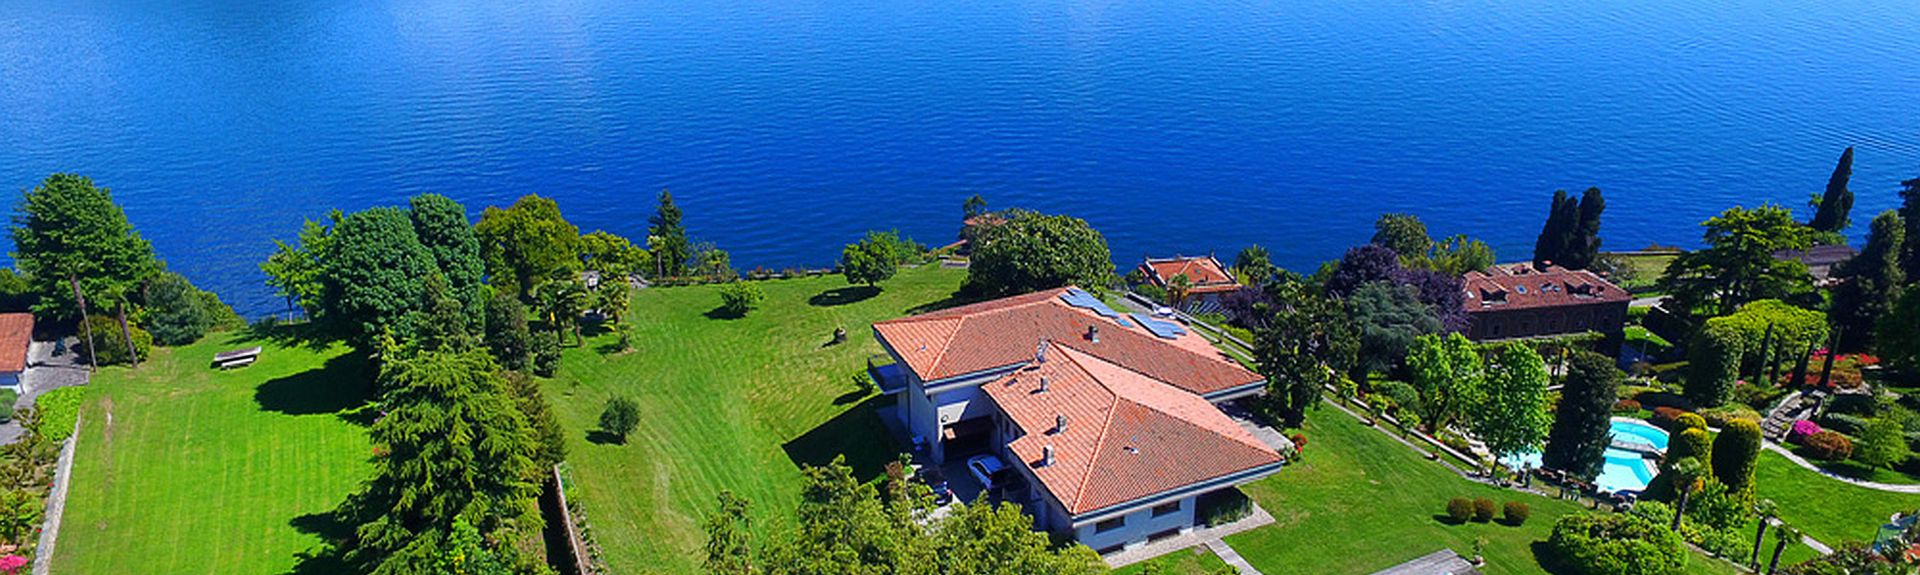 Betulla, Lombardia, Italia